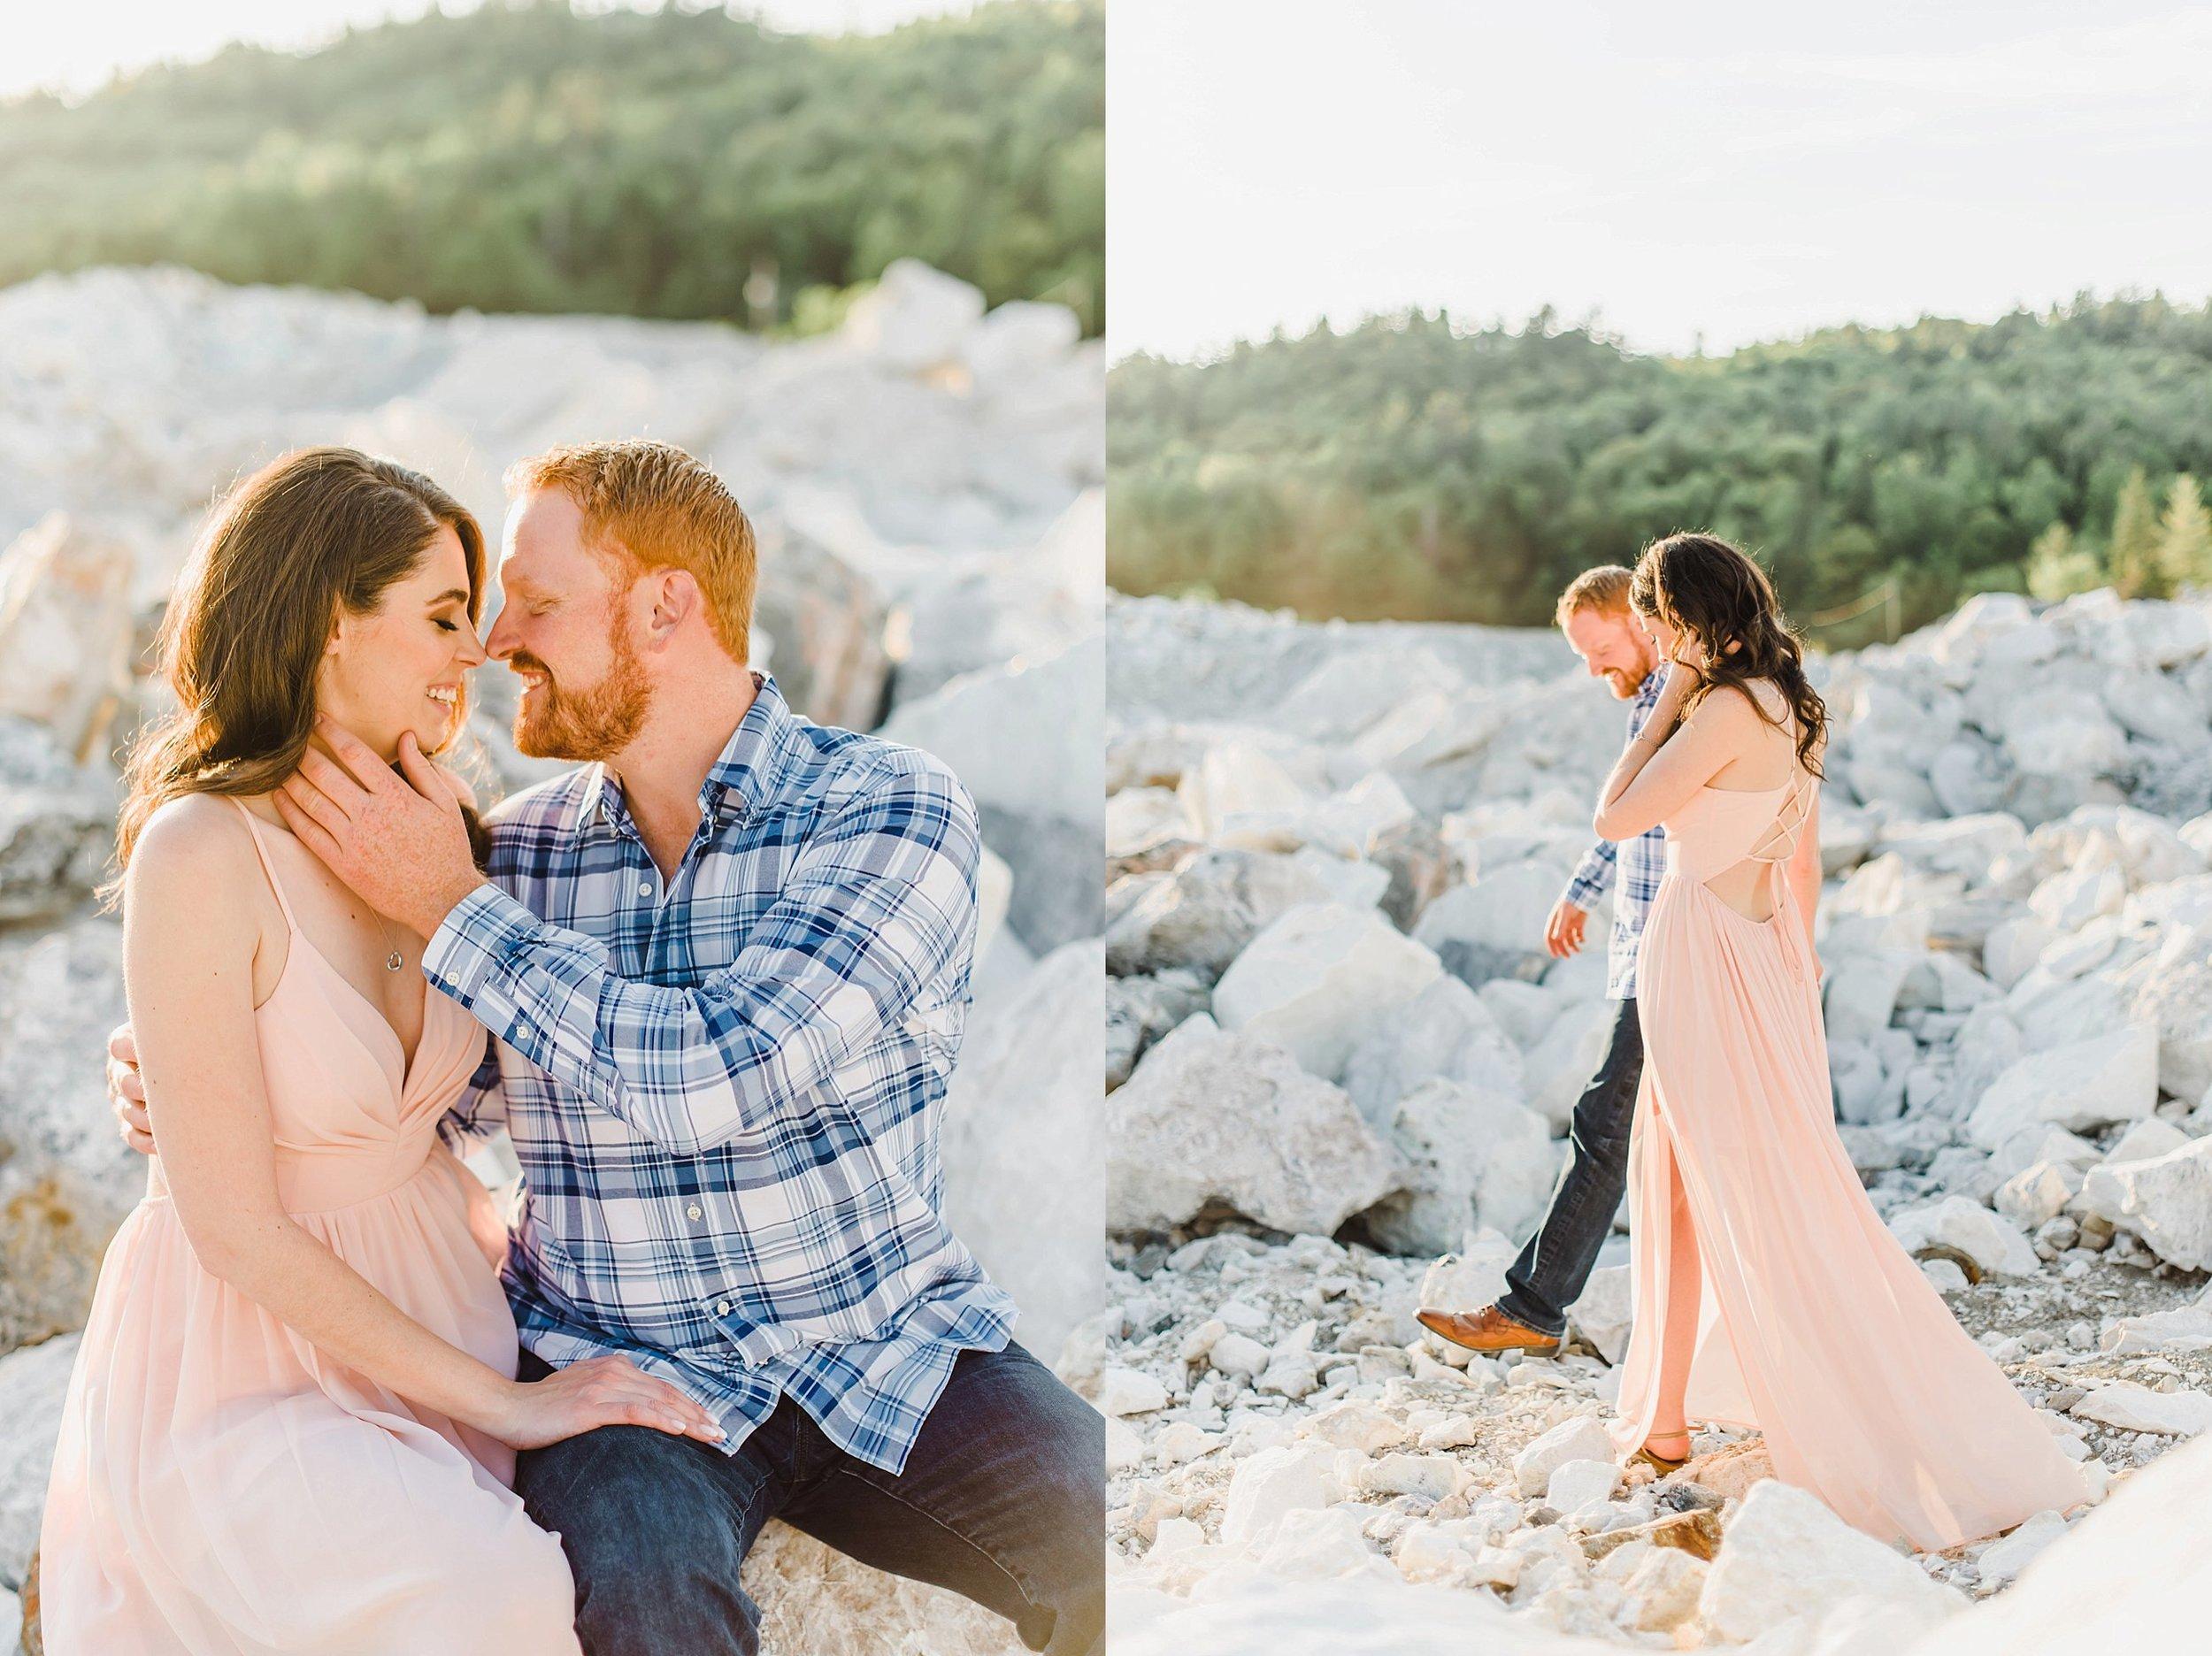 light airy indie fine art ottawa wedding photographer | Ali and Batoul Photography_0677.jpg